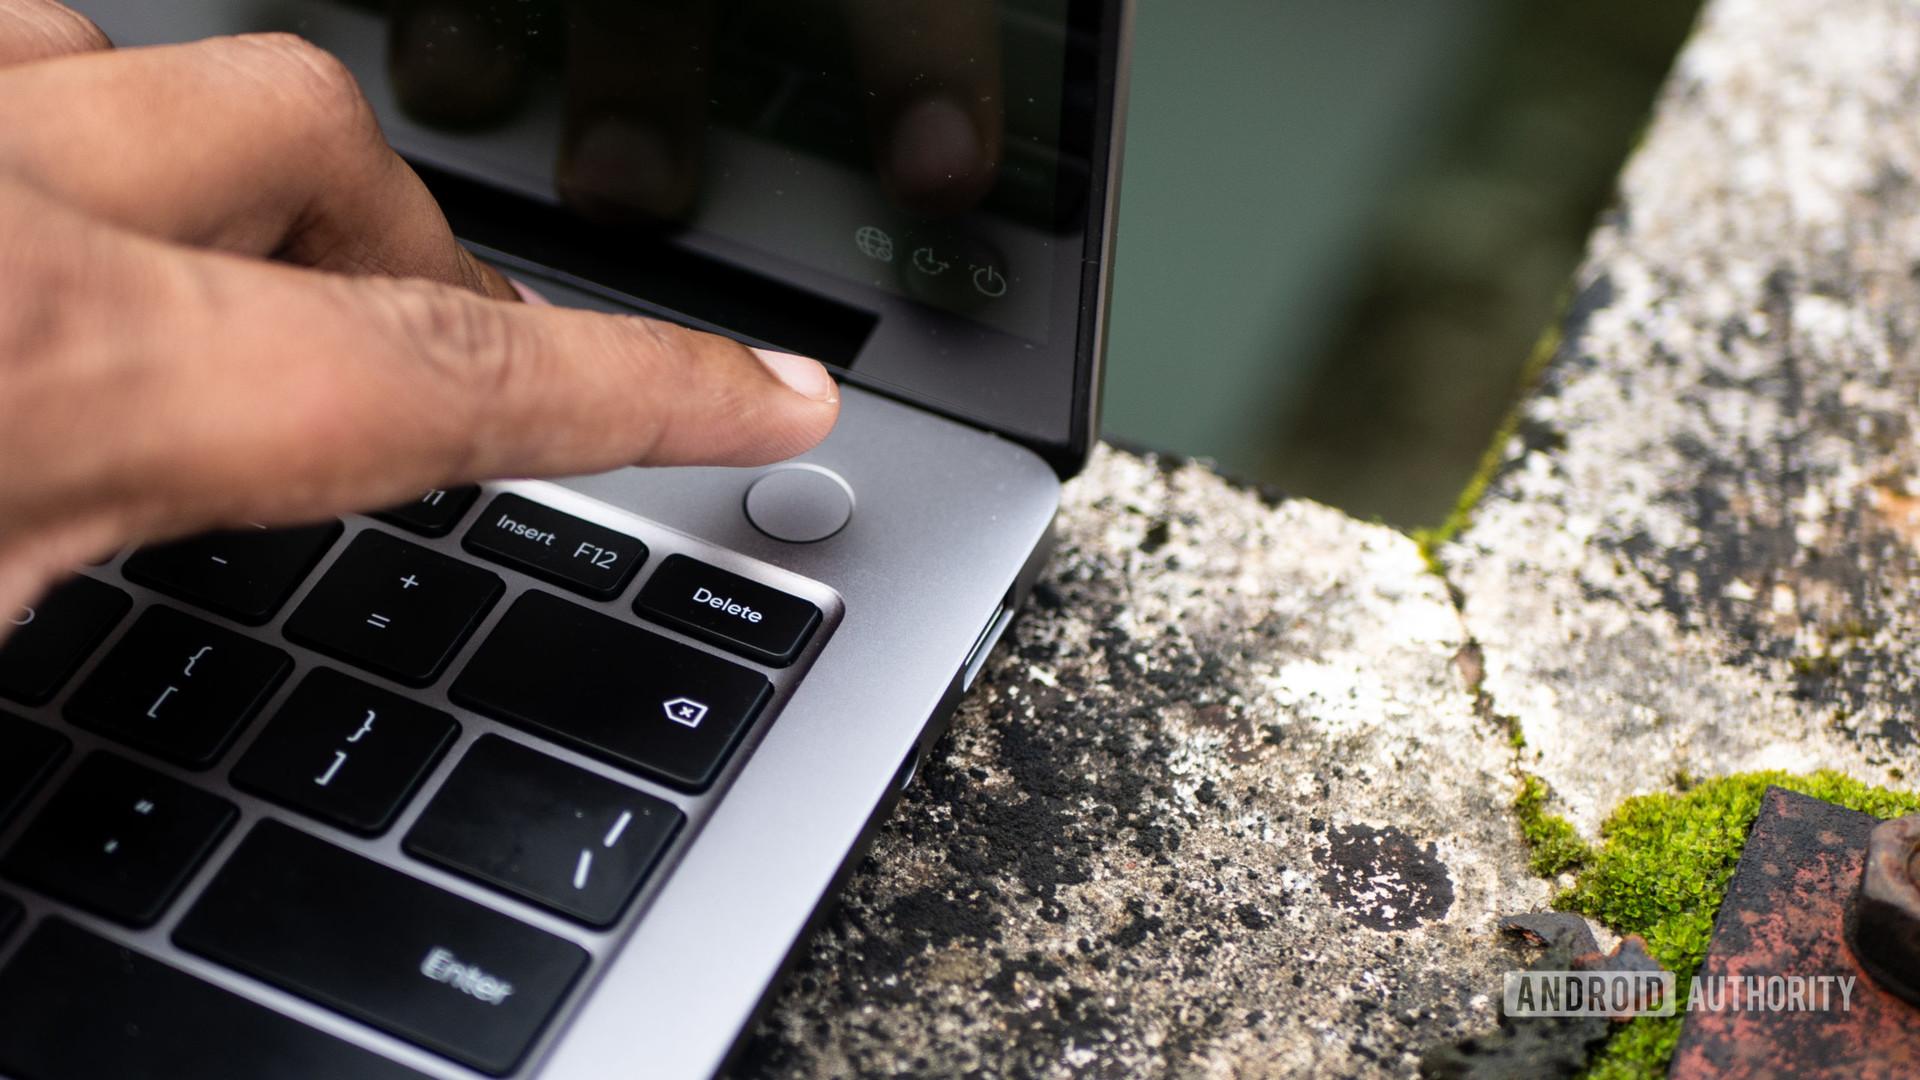 Realme Book fingerprint sensor